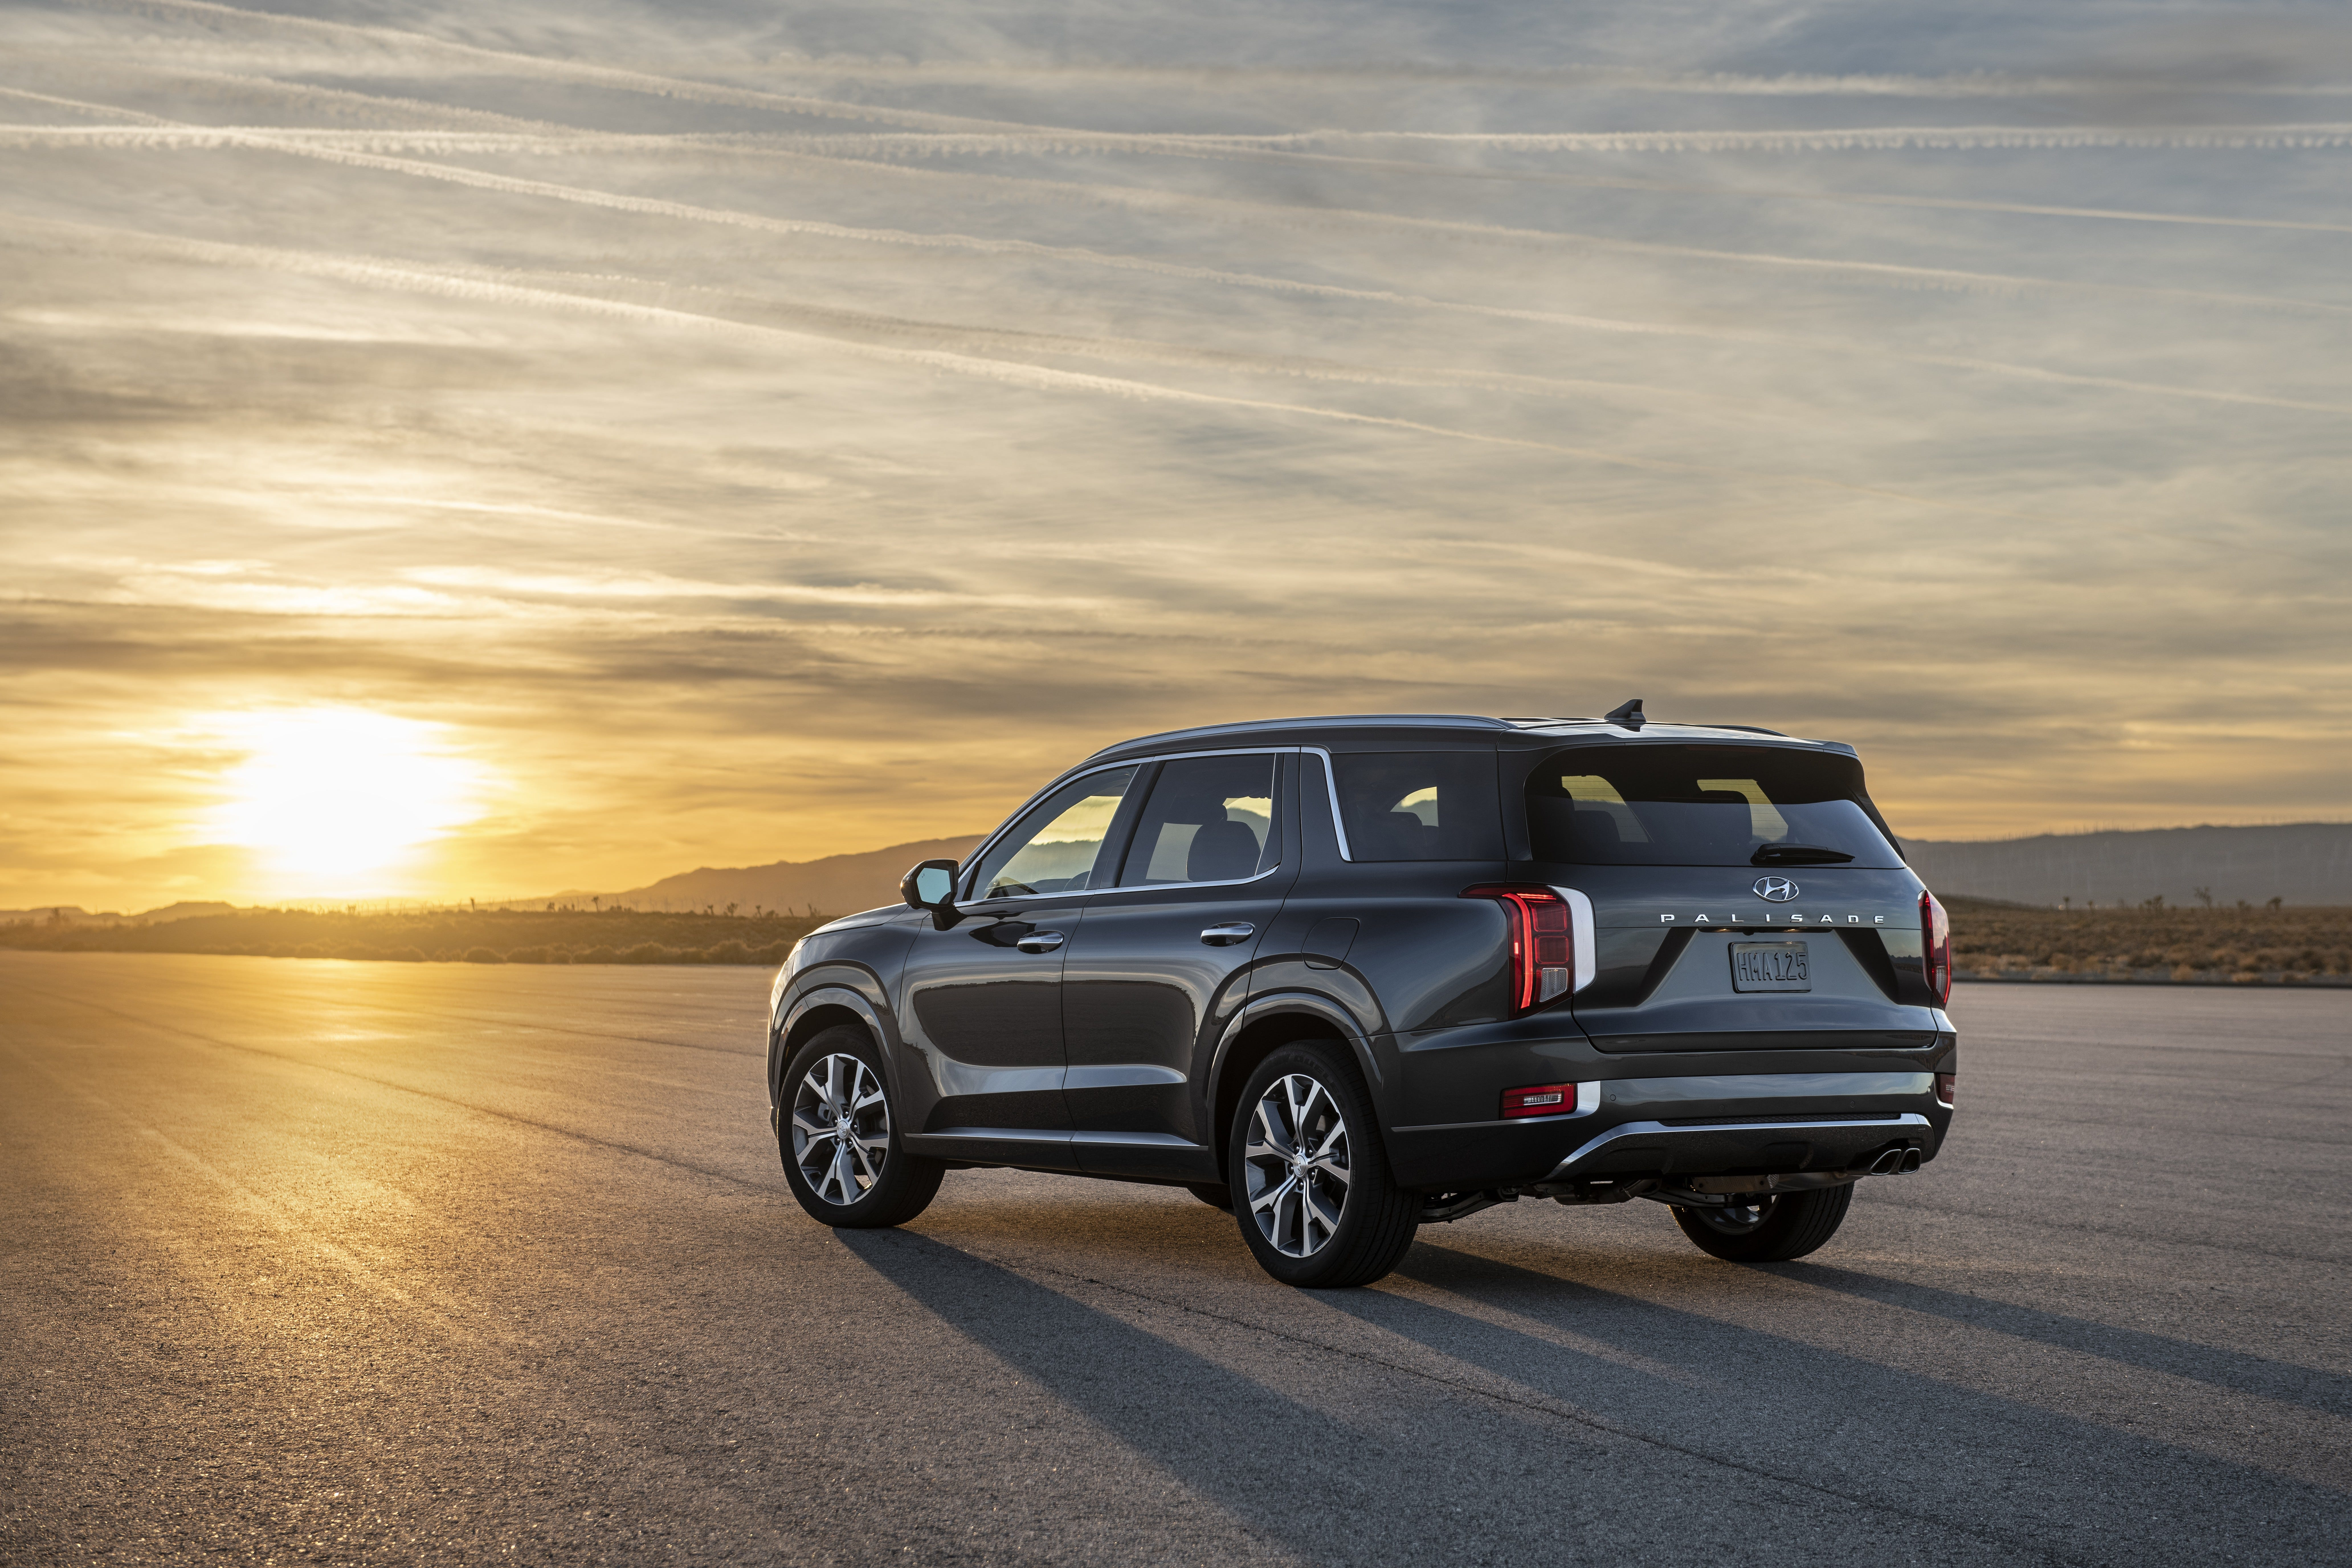 8 Seat Suv >> La Auto Show Hyundai Palisade 3 Row Suv Makes Global Debut